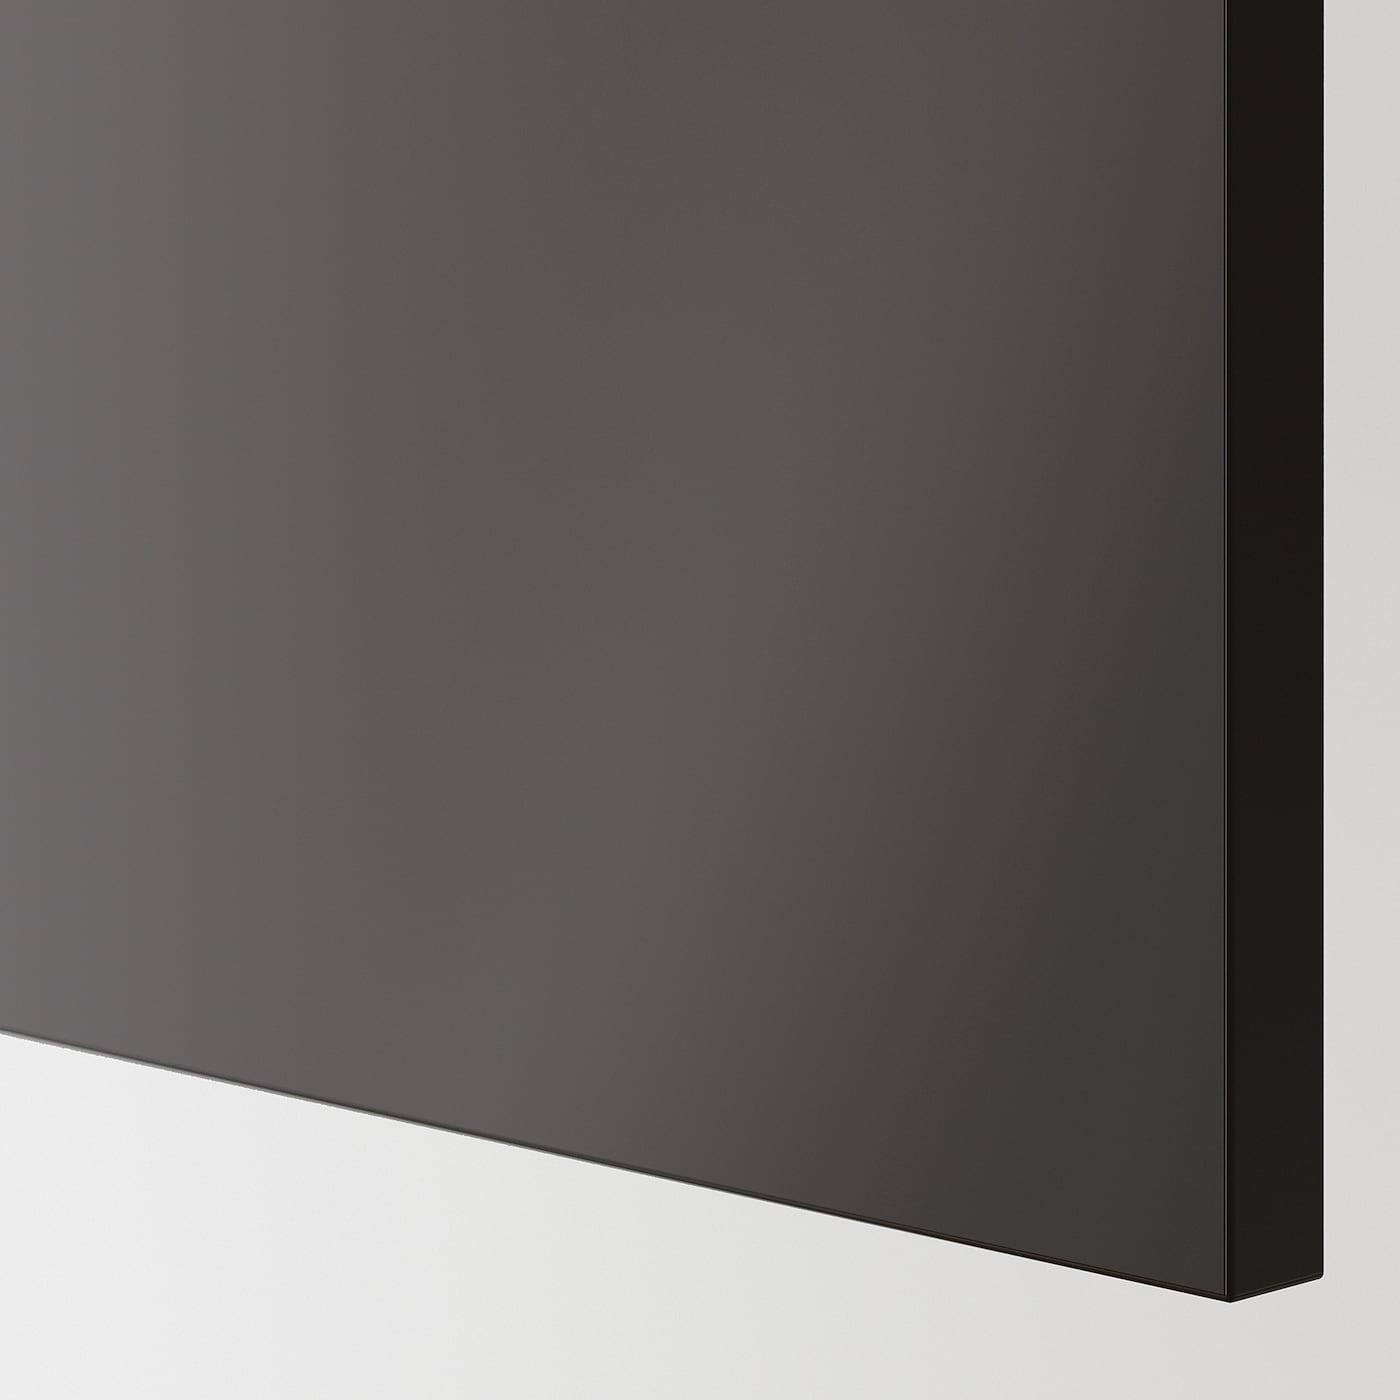 Full Size of Ikea Led Panel Kungsbacka Cover Miniküche Beleuchtung Küche Büffelleder Sofa Kunstleder Big Leder Bad Betten Bei Kaufen Kosten Mit Schlaffunktion Wohnzimmer Ikea Led Panel